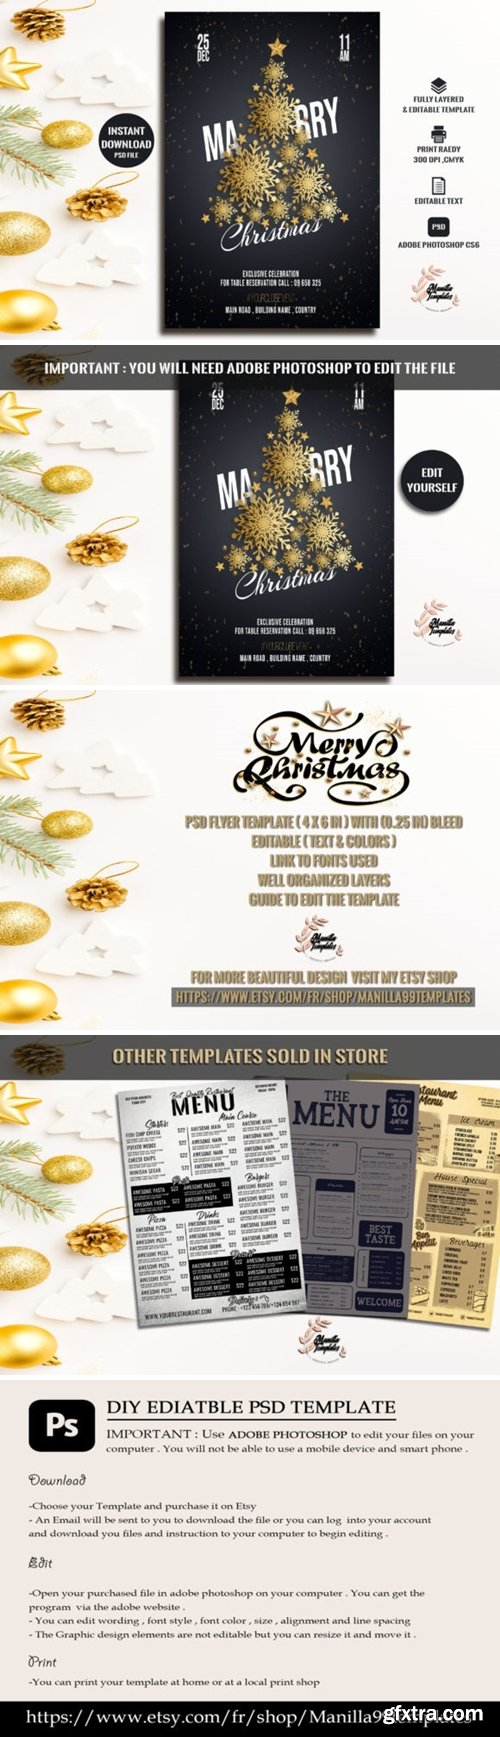 Marry Christmas Invitation 2178890